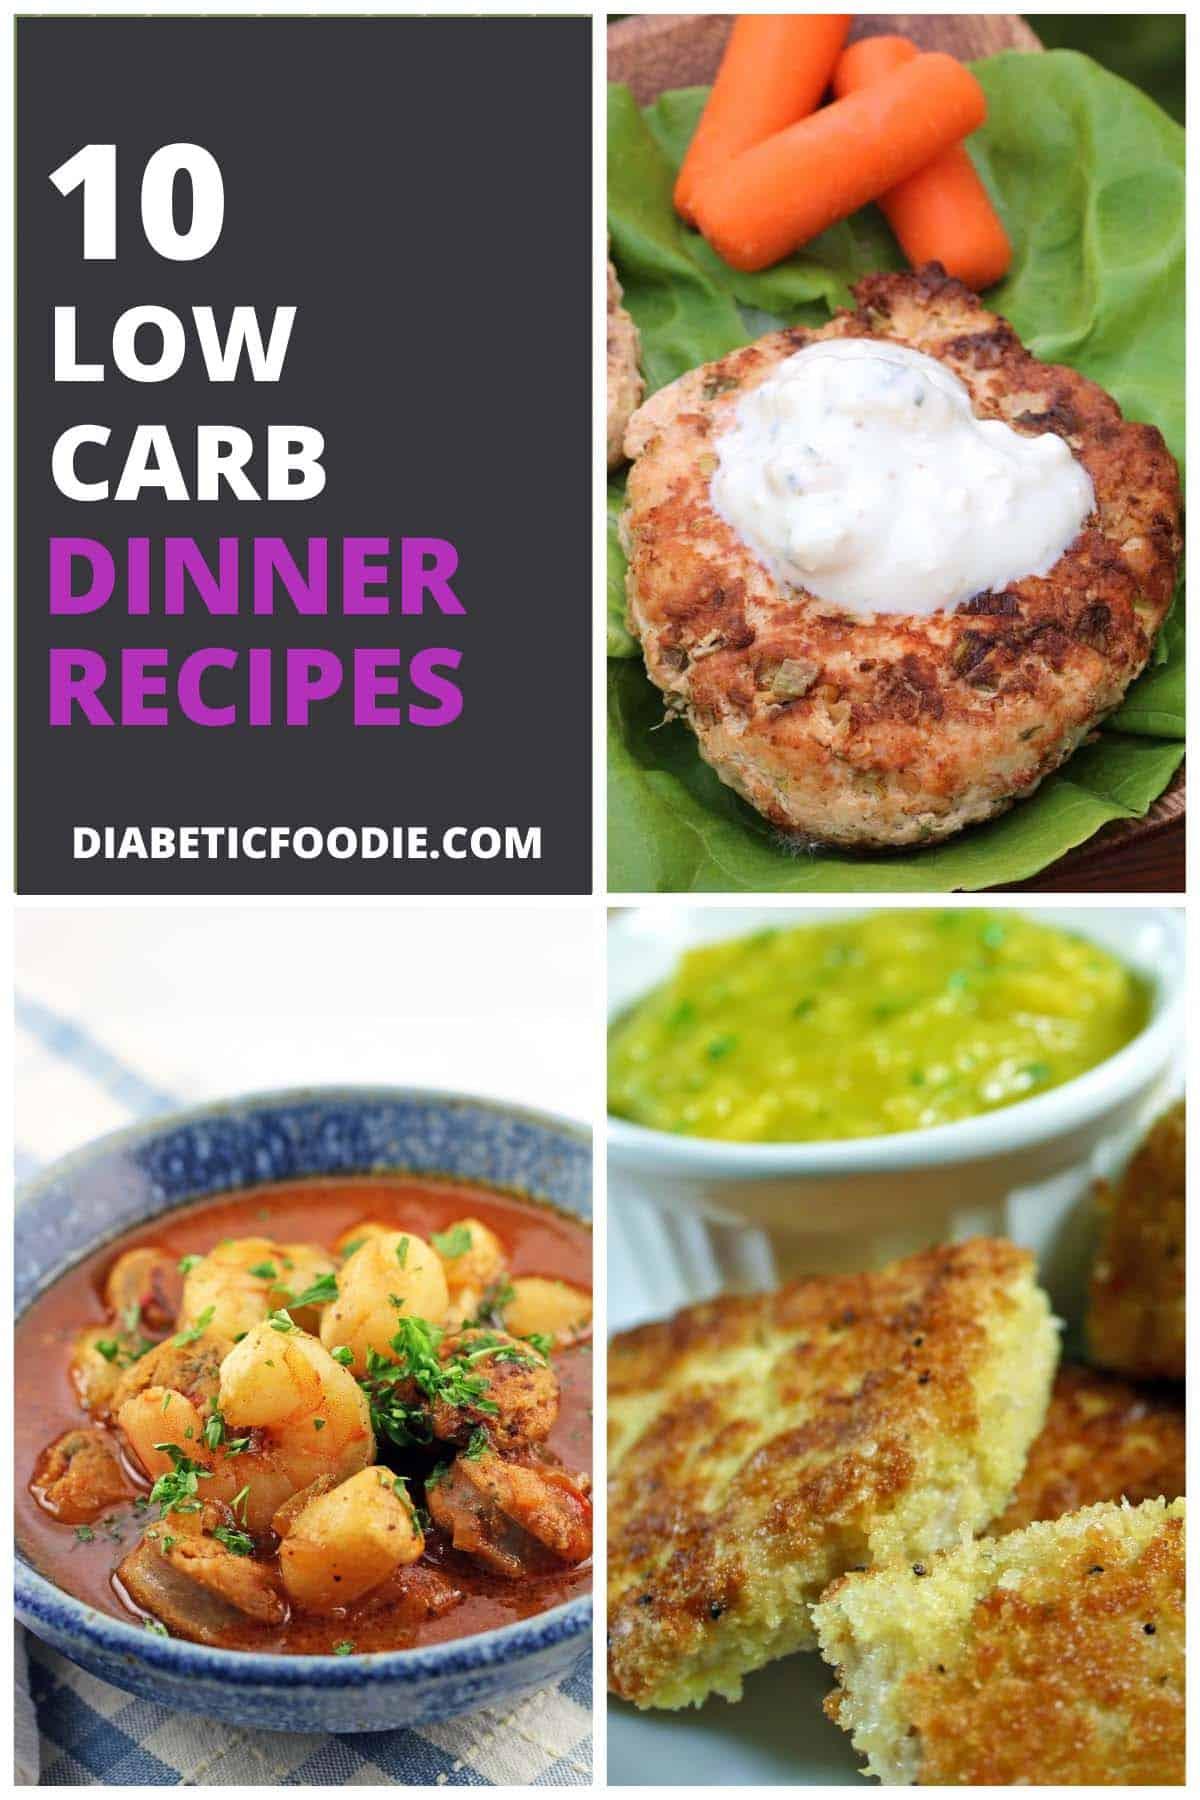 10 Low-Carb Dinner Recipes for Diabetics